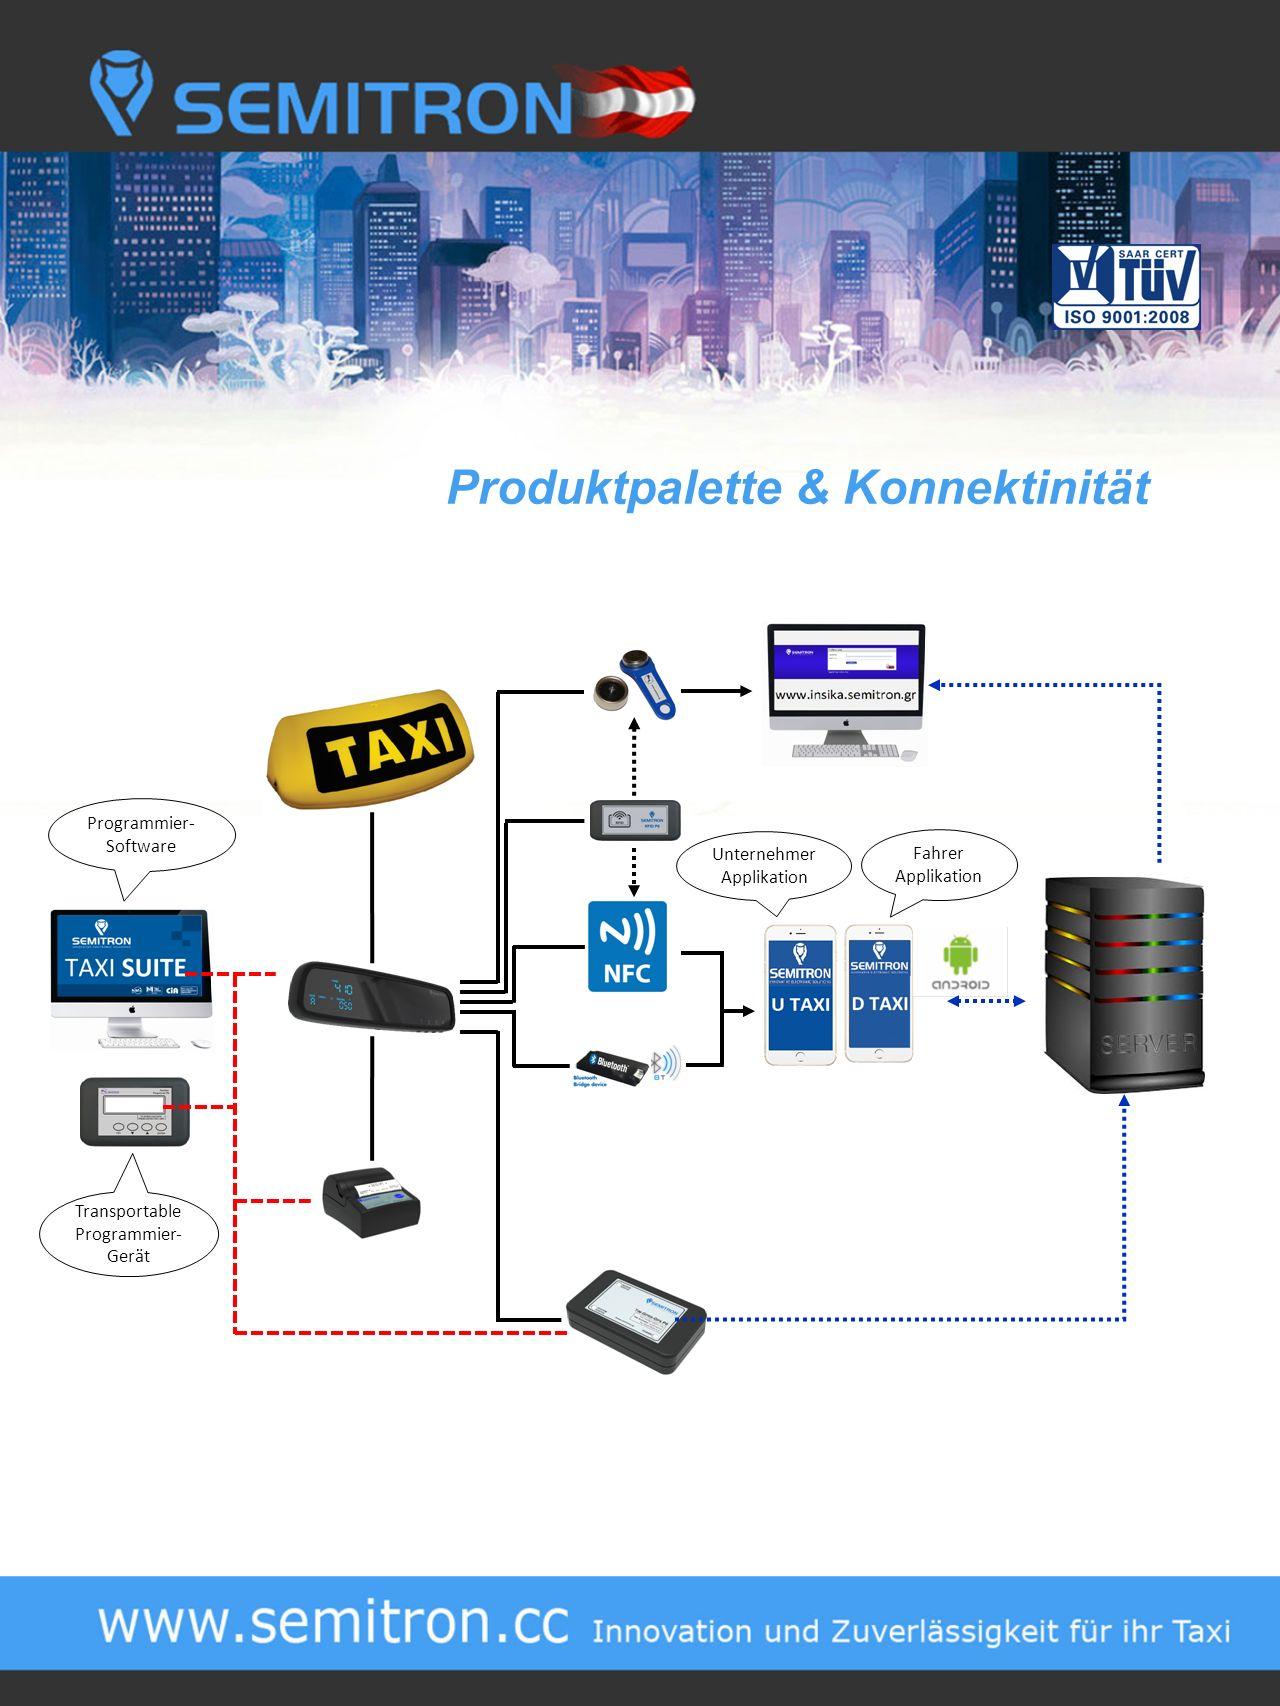 Fahrer Applikation Unternehmer Applikation Programmier- Software Transportable Programmier- Gerät Produktpalette & Konnektinität